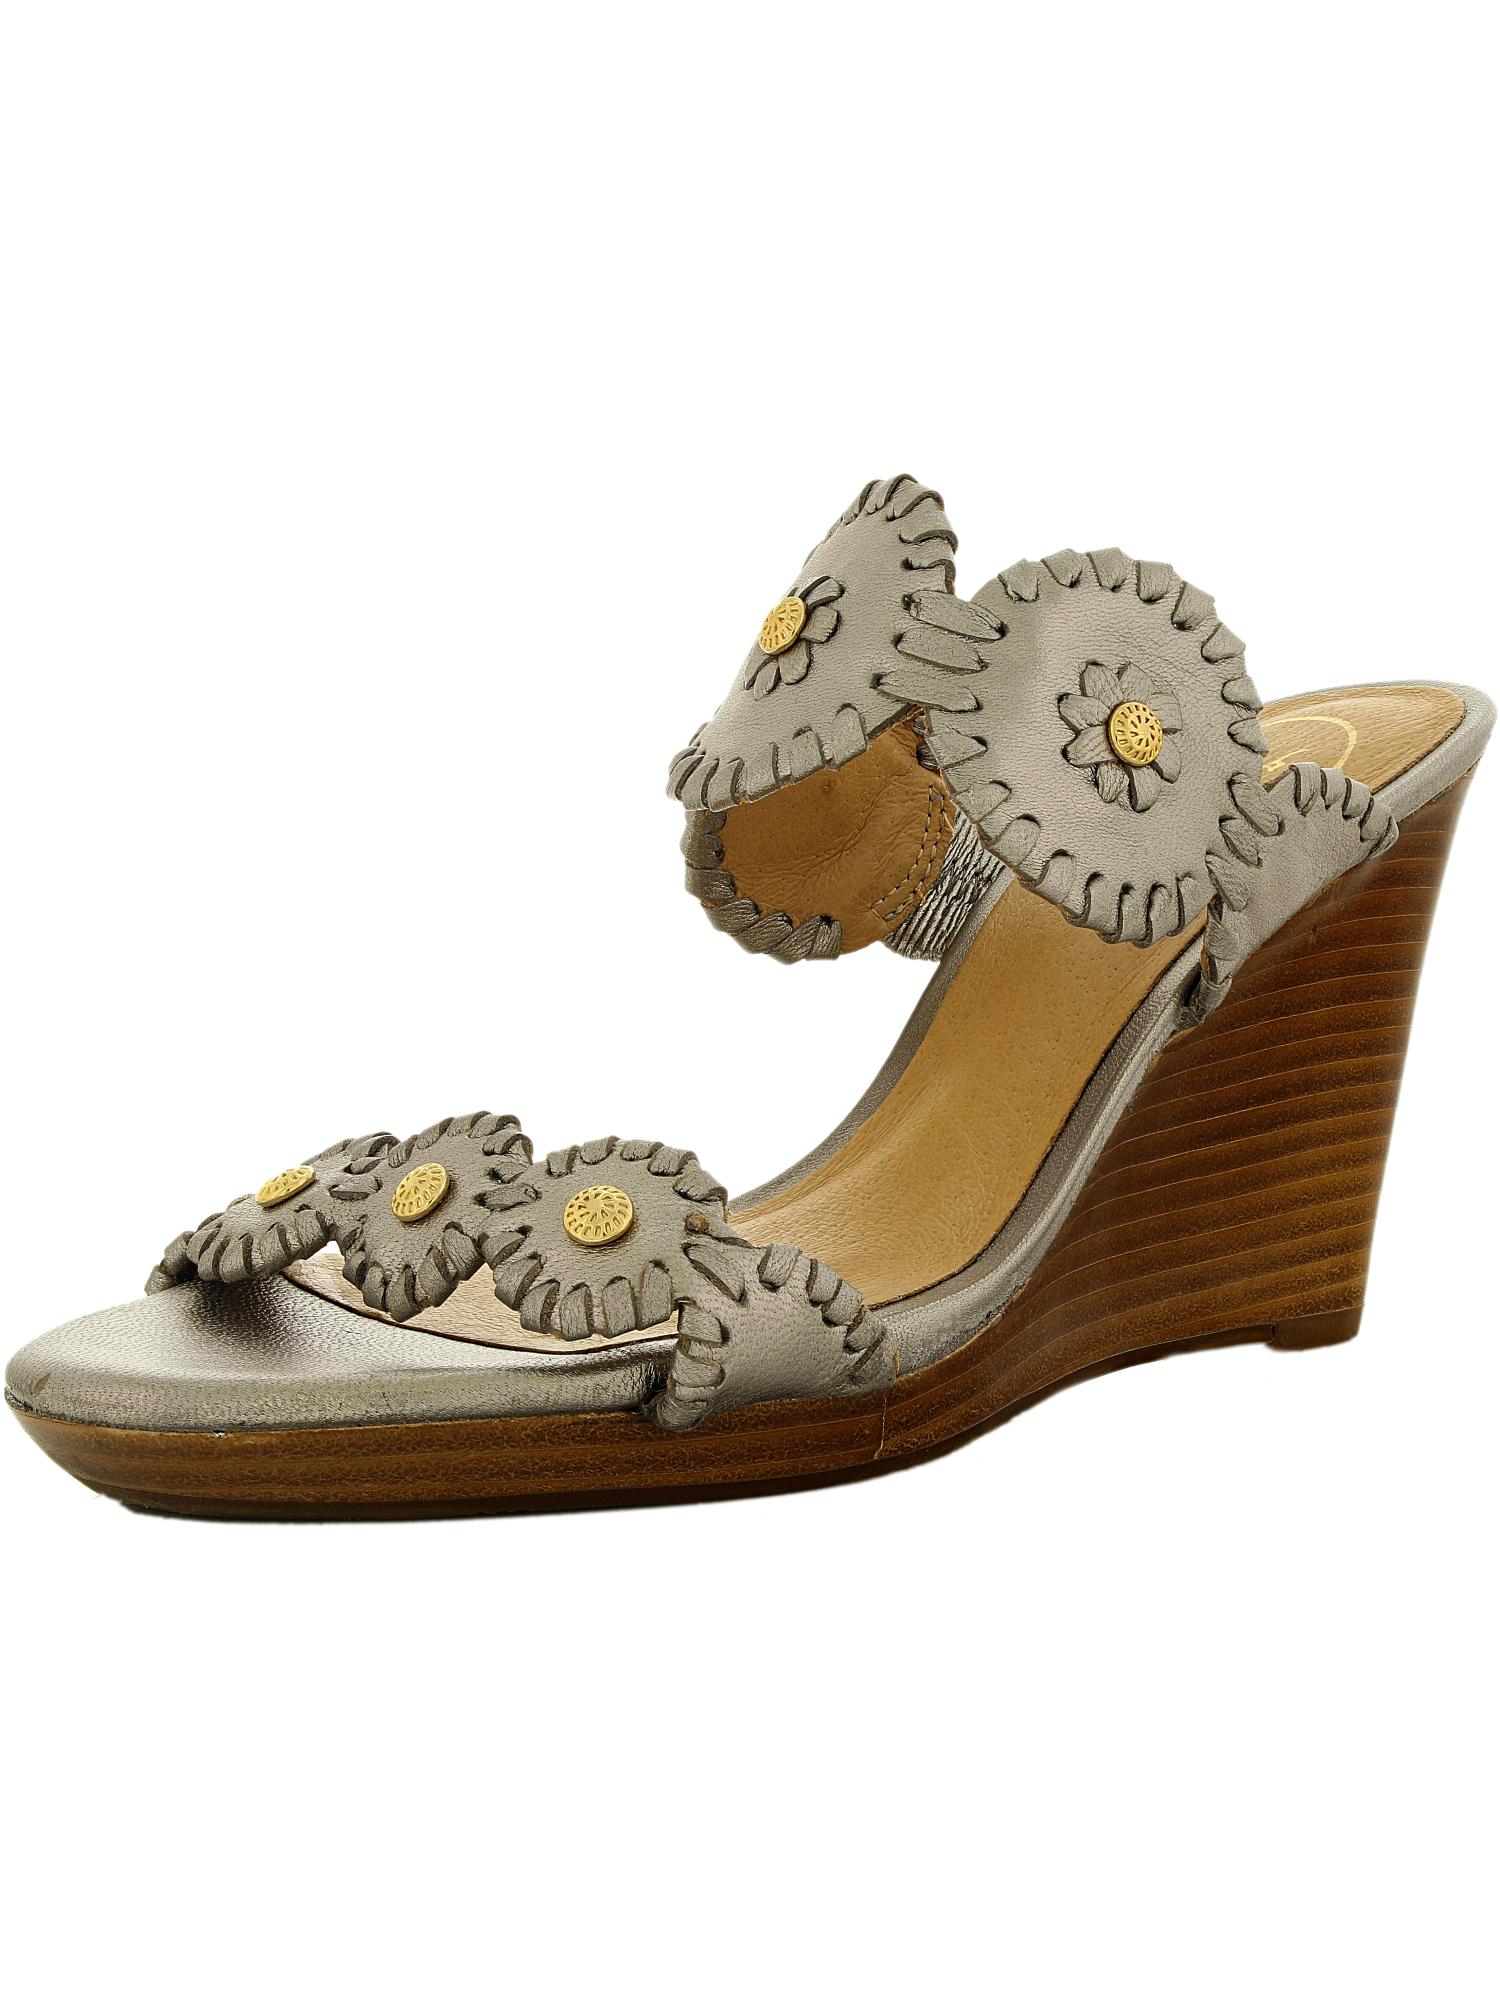 c4b031af080 Jack Rogers Women s Layne Leather Ankle-High Sandal